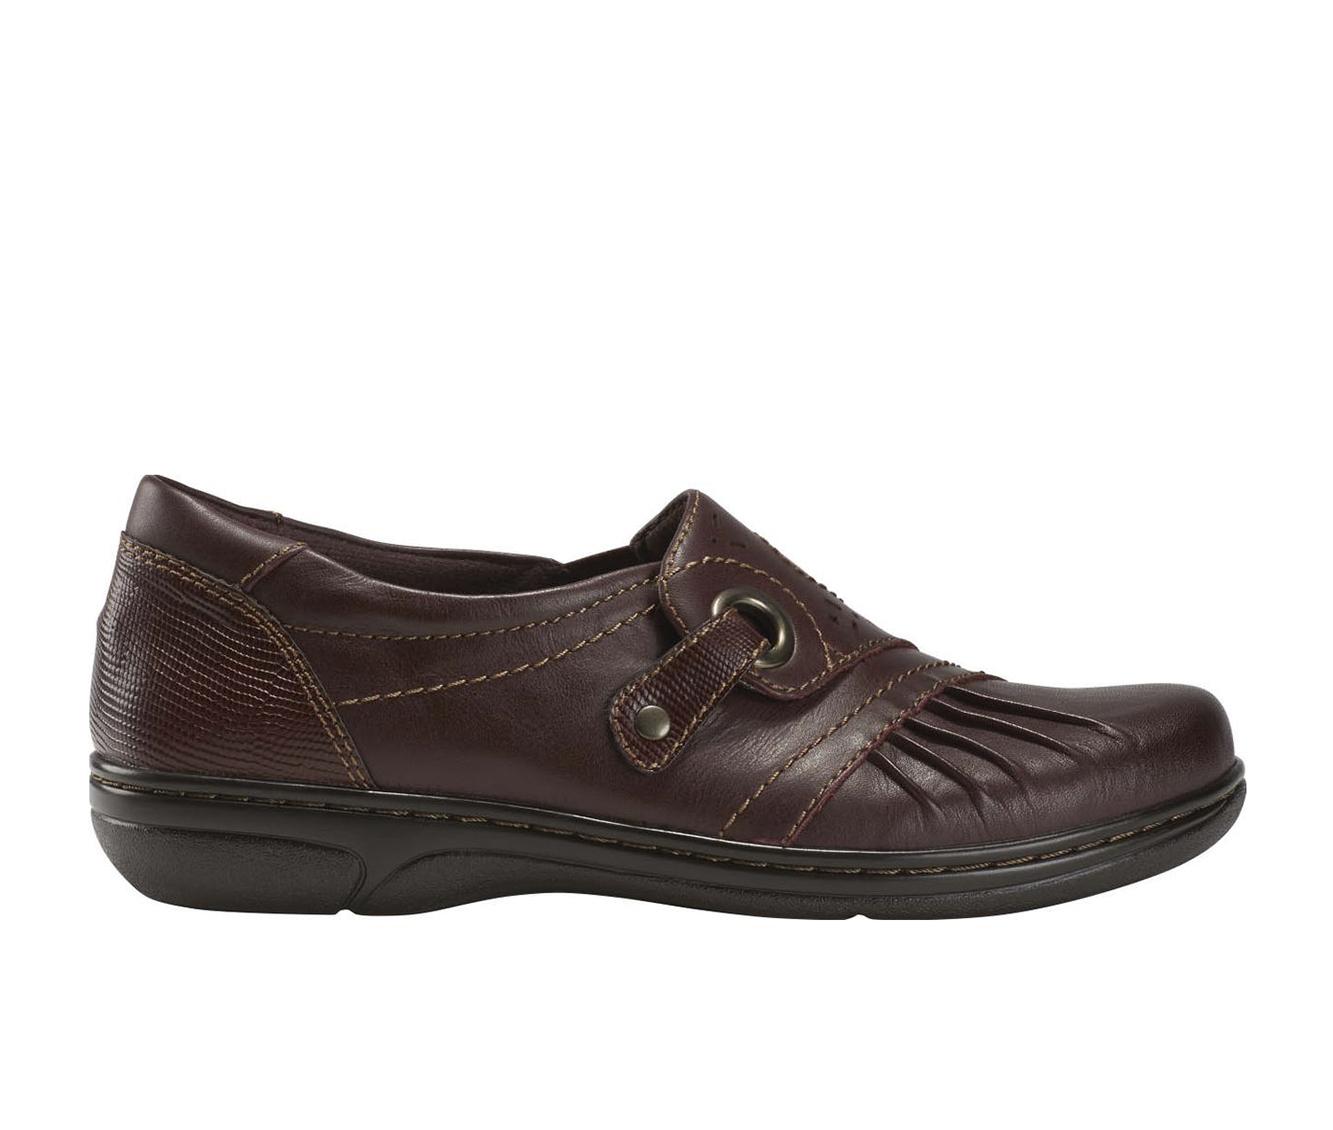 Earth Origins Glendale Gabrielle Women's Shoe (Red Leather)